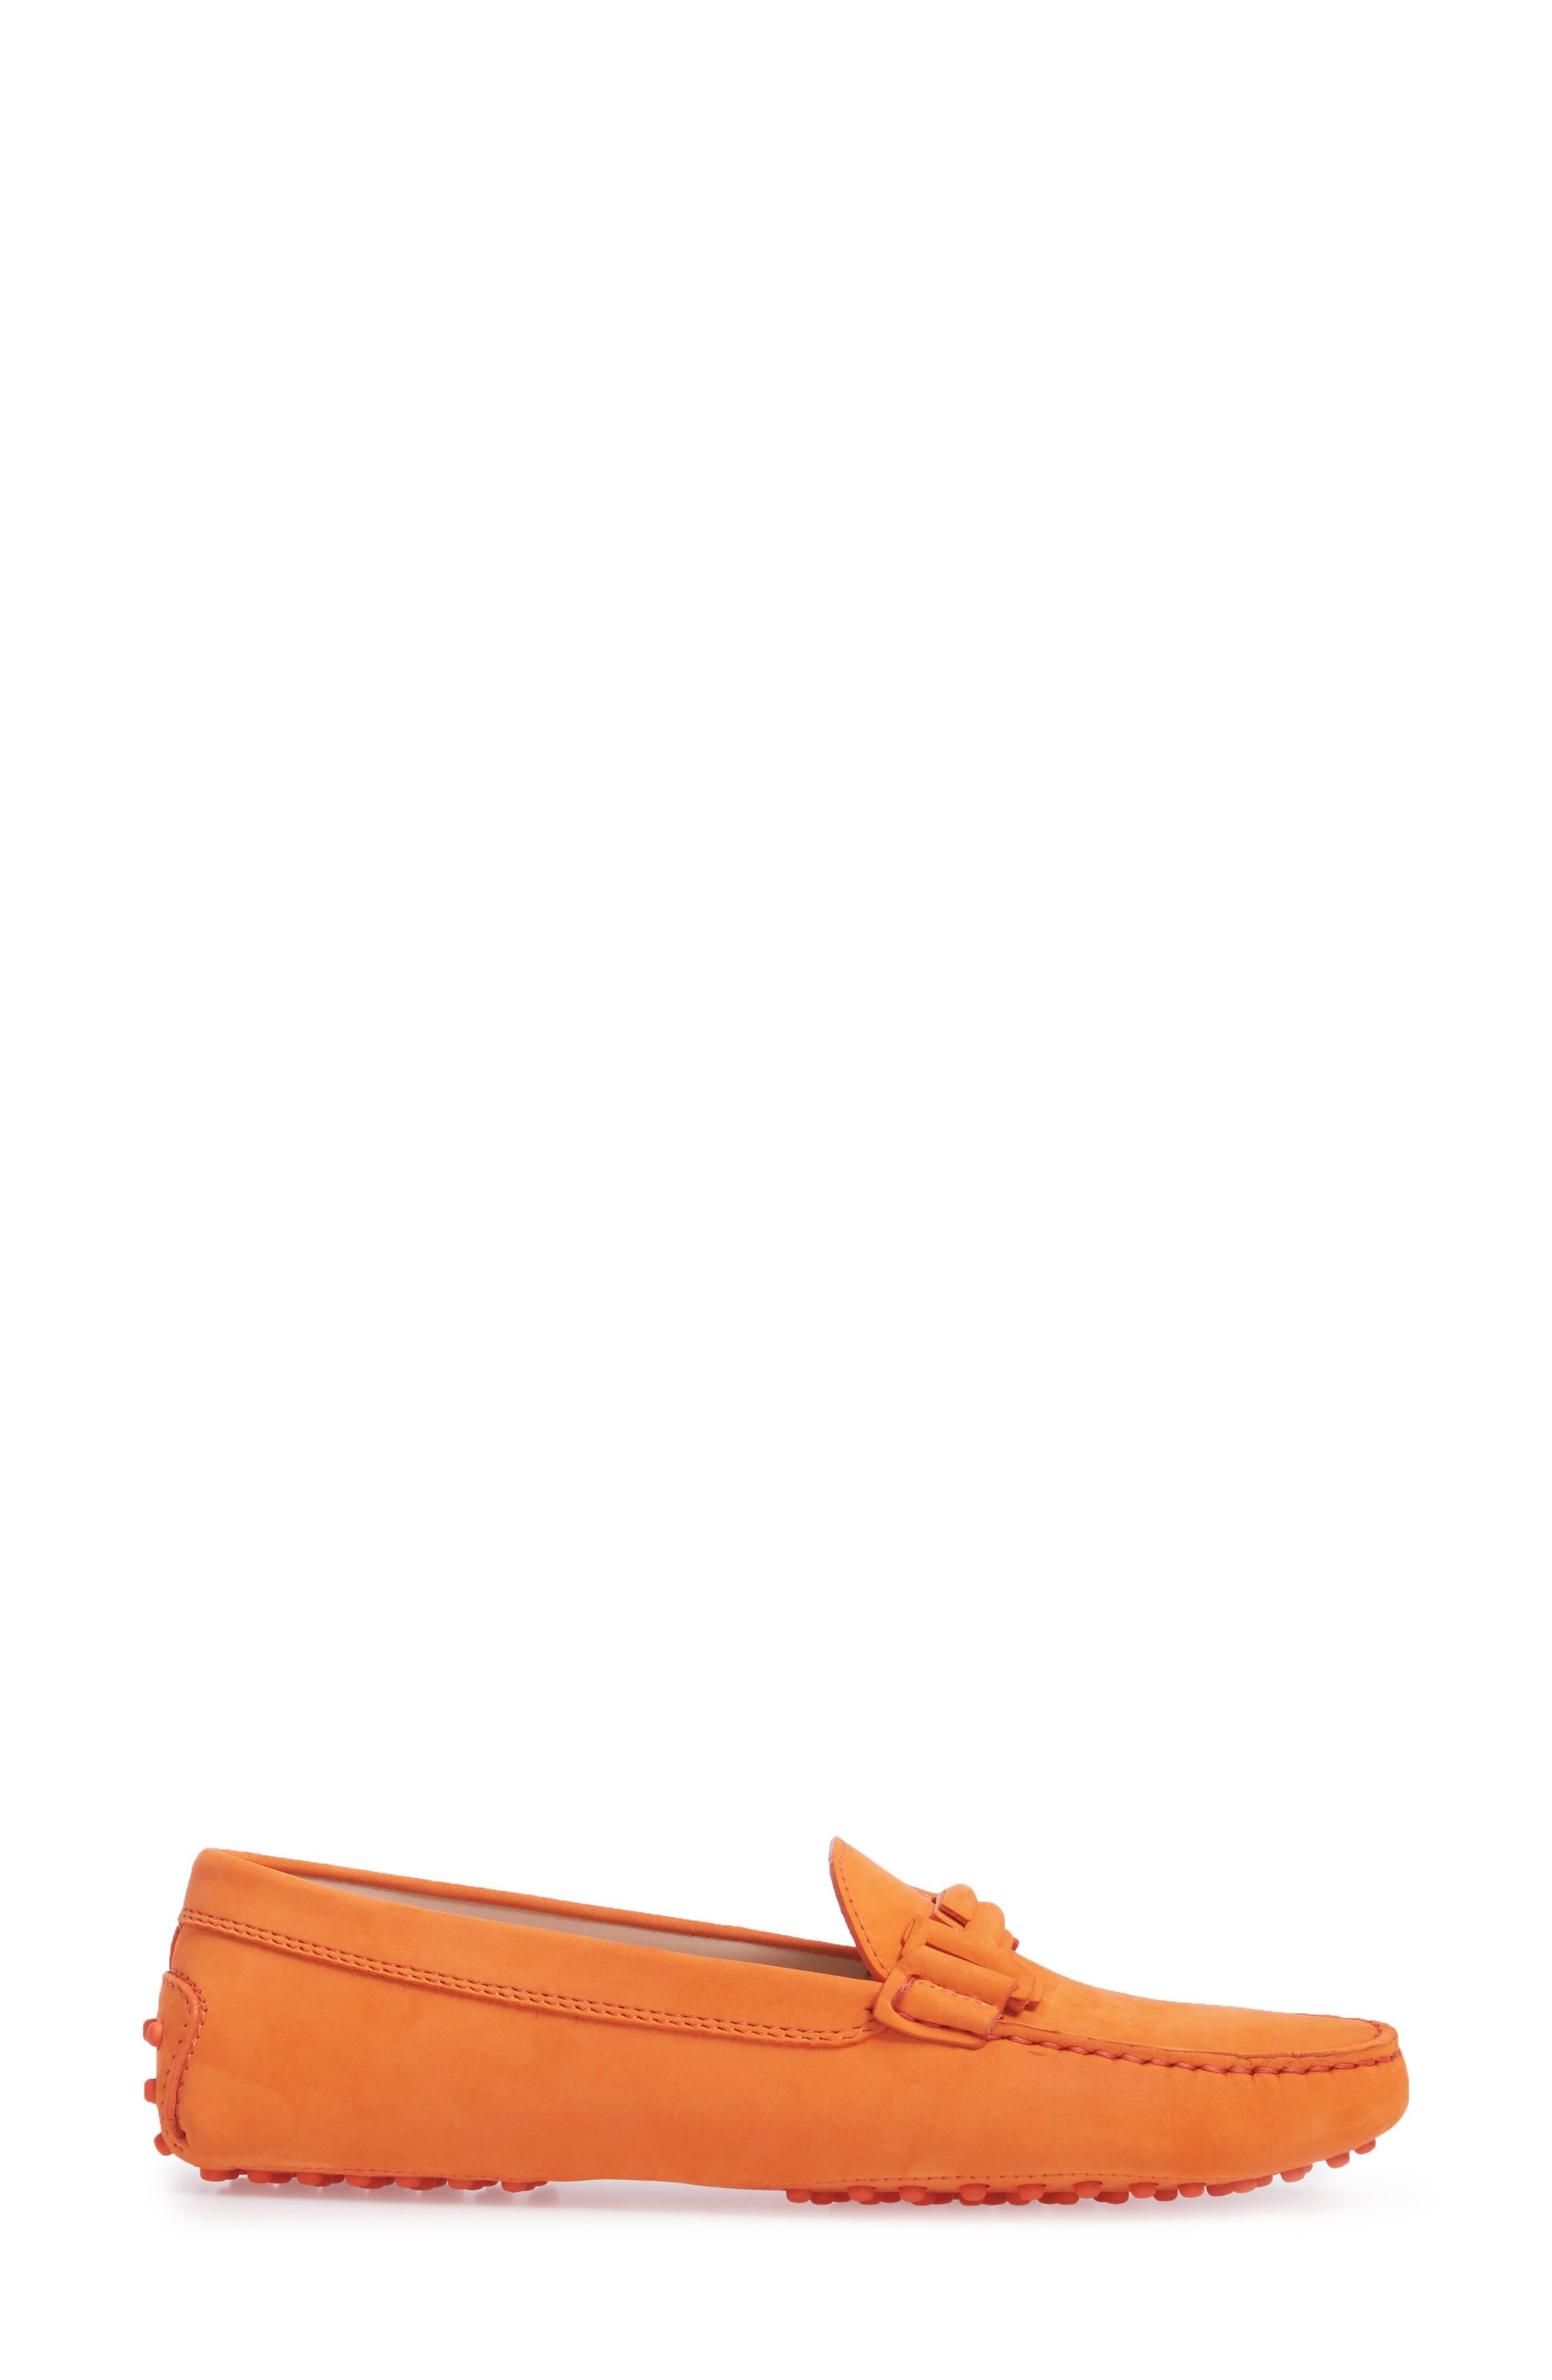 Gommini Covered Double T Loafer,                             Alternate thumbnail 3, color,                             Orange